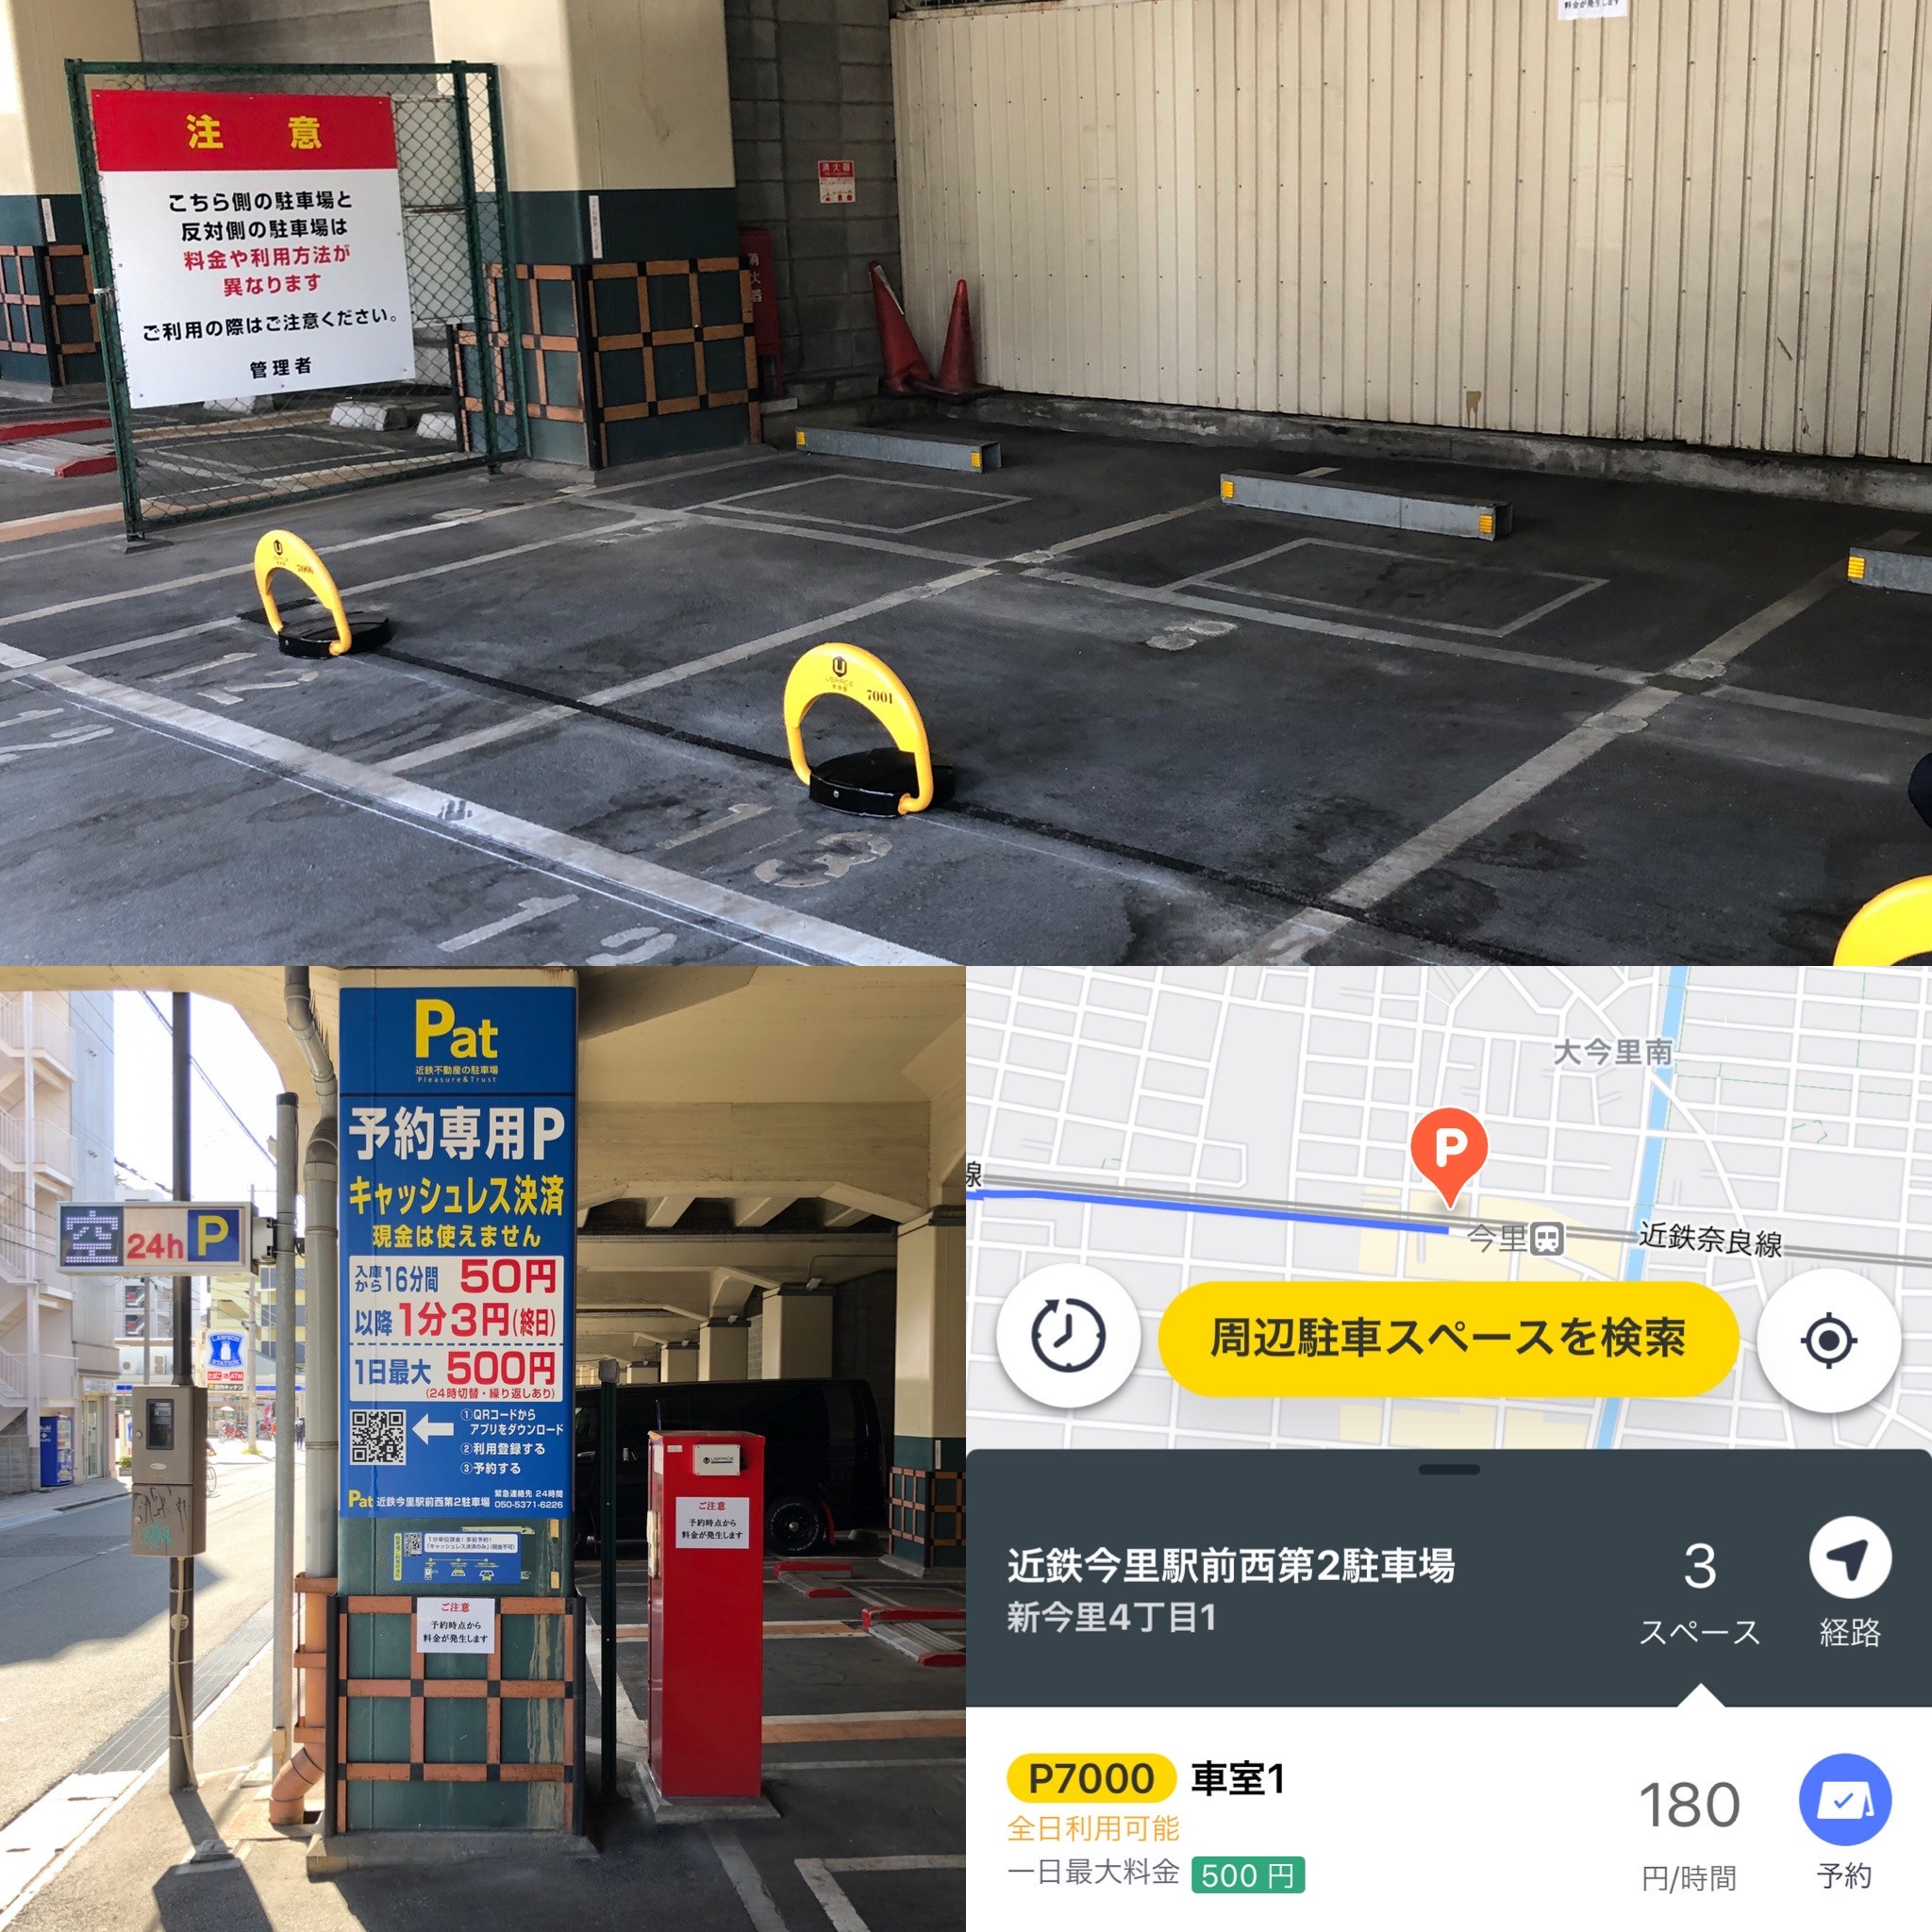 AI/IoT駐車場(オーナー様向け)サービス